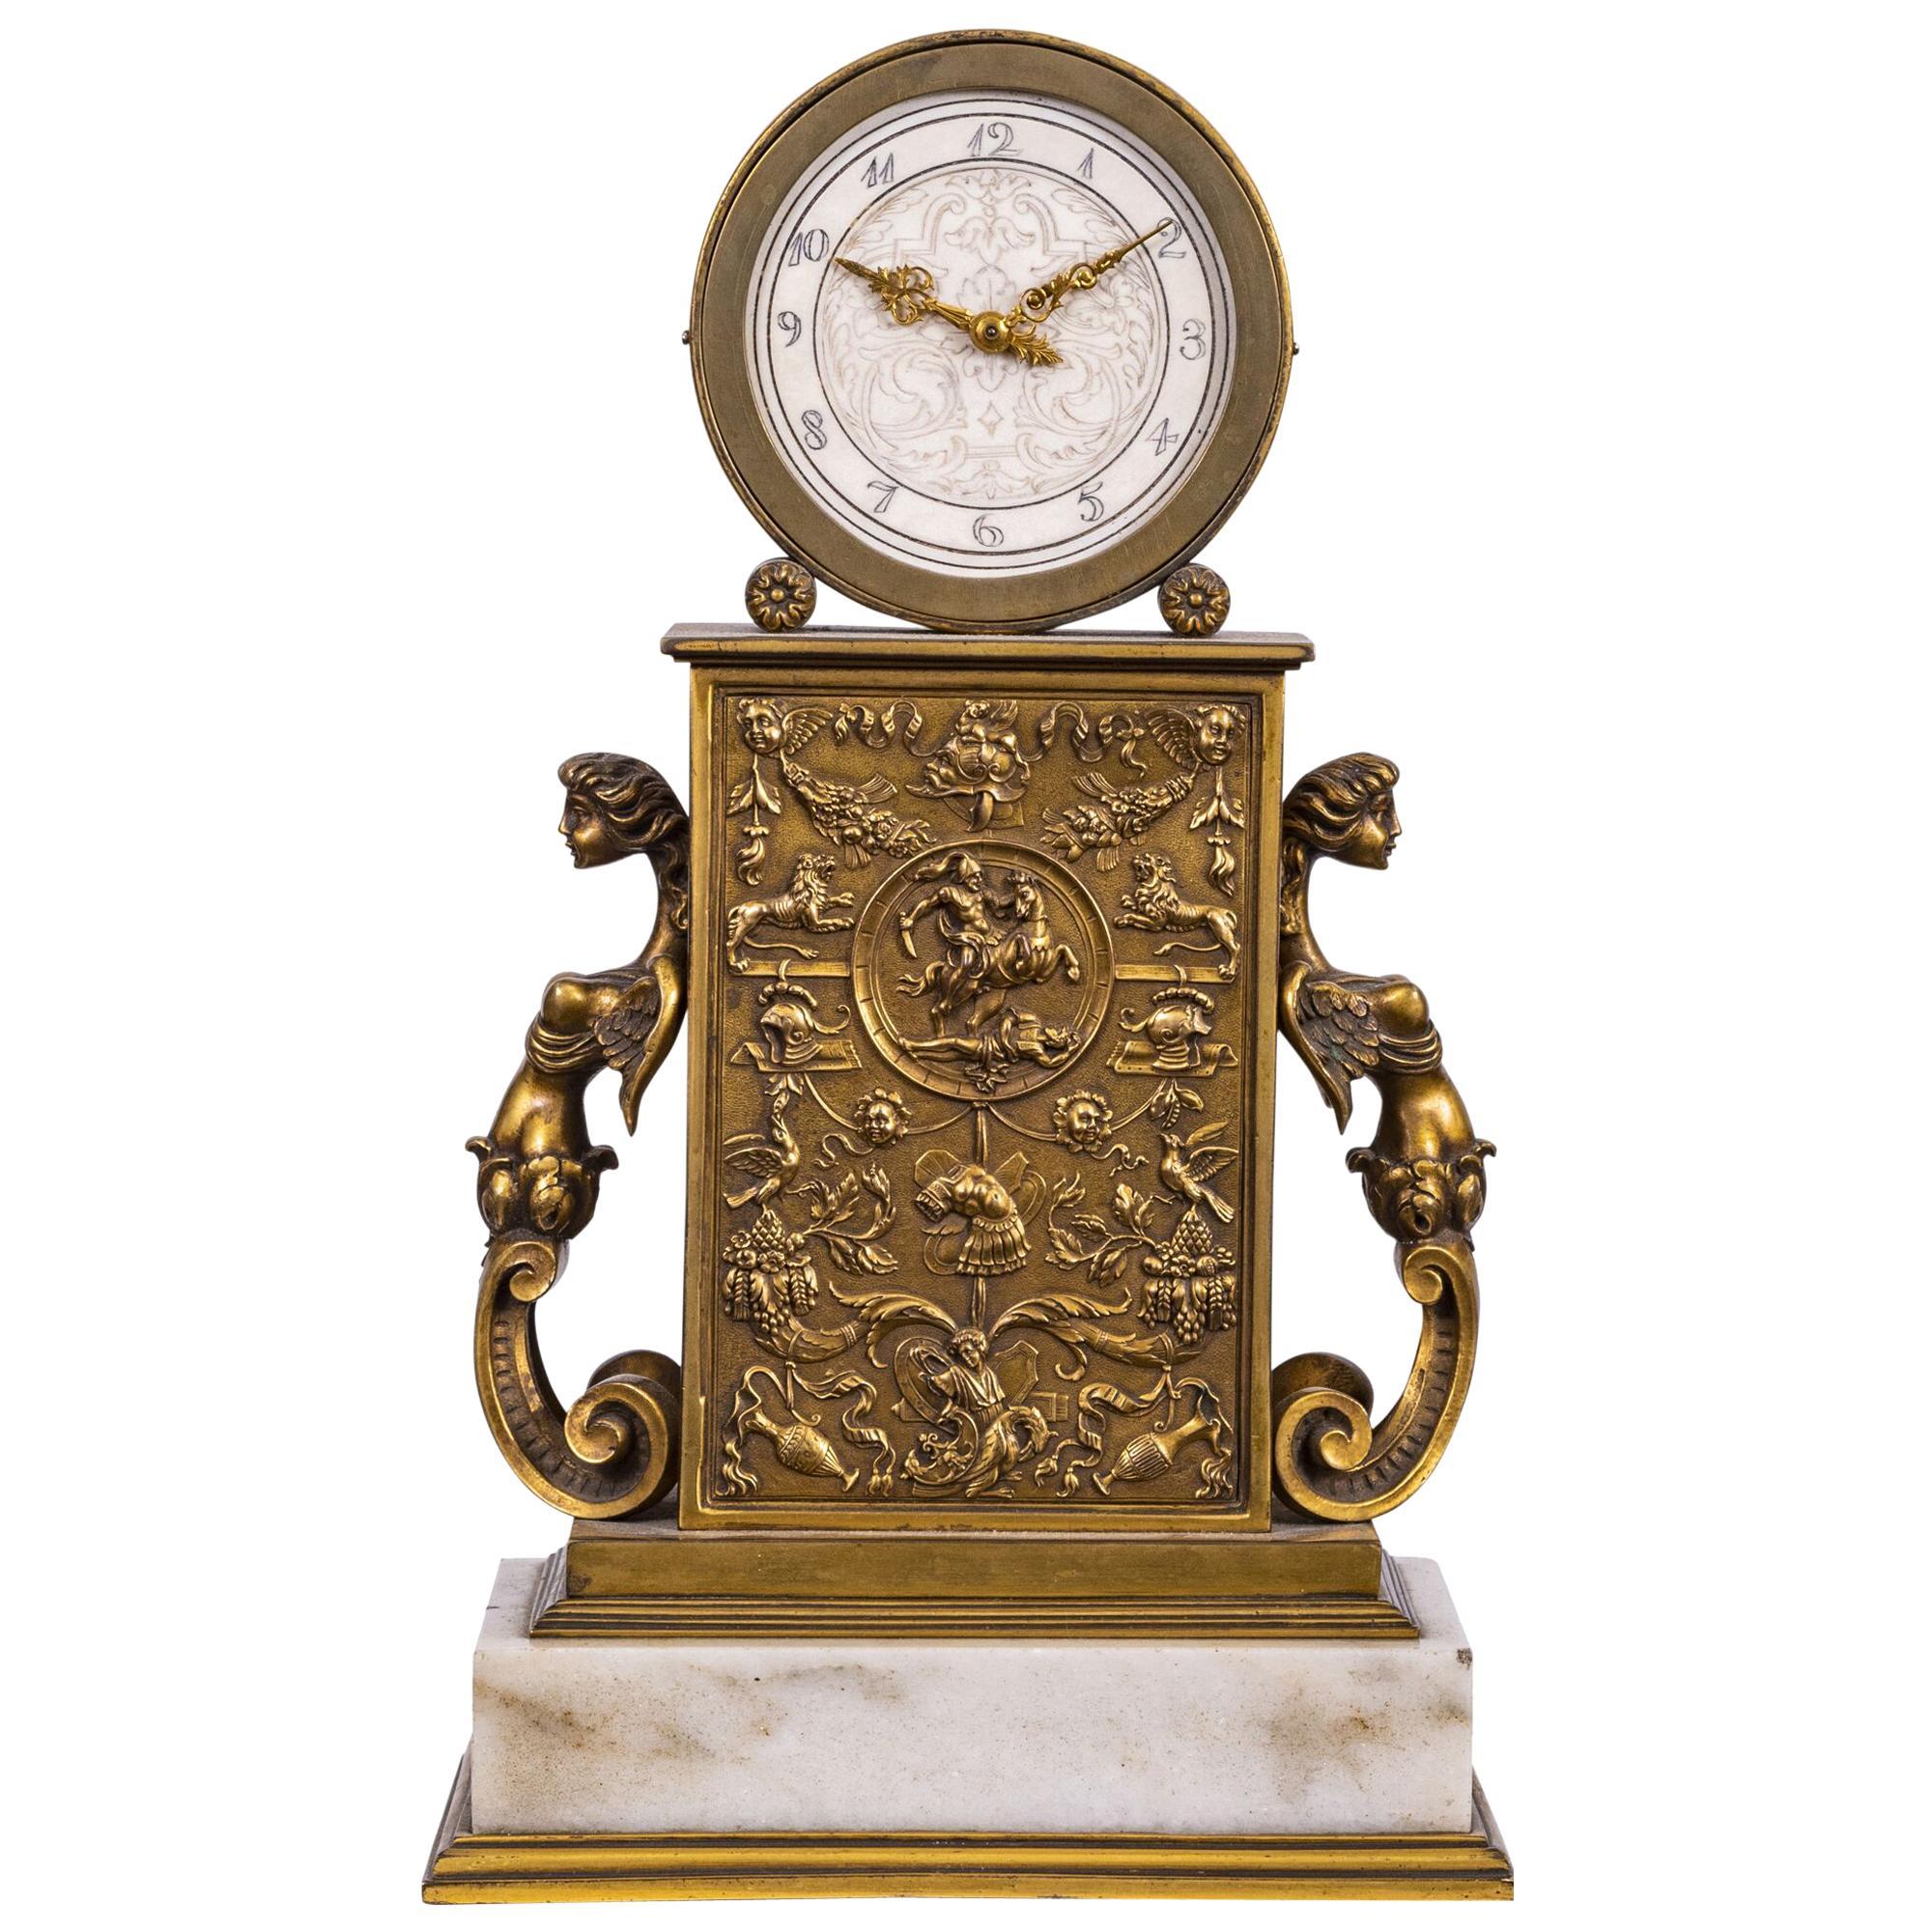 Edward F. Caldwell & Co. Metal Table Clock